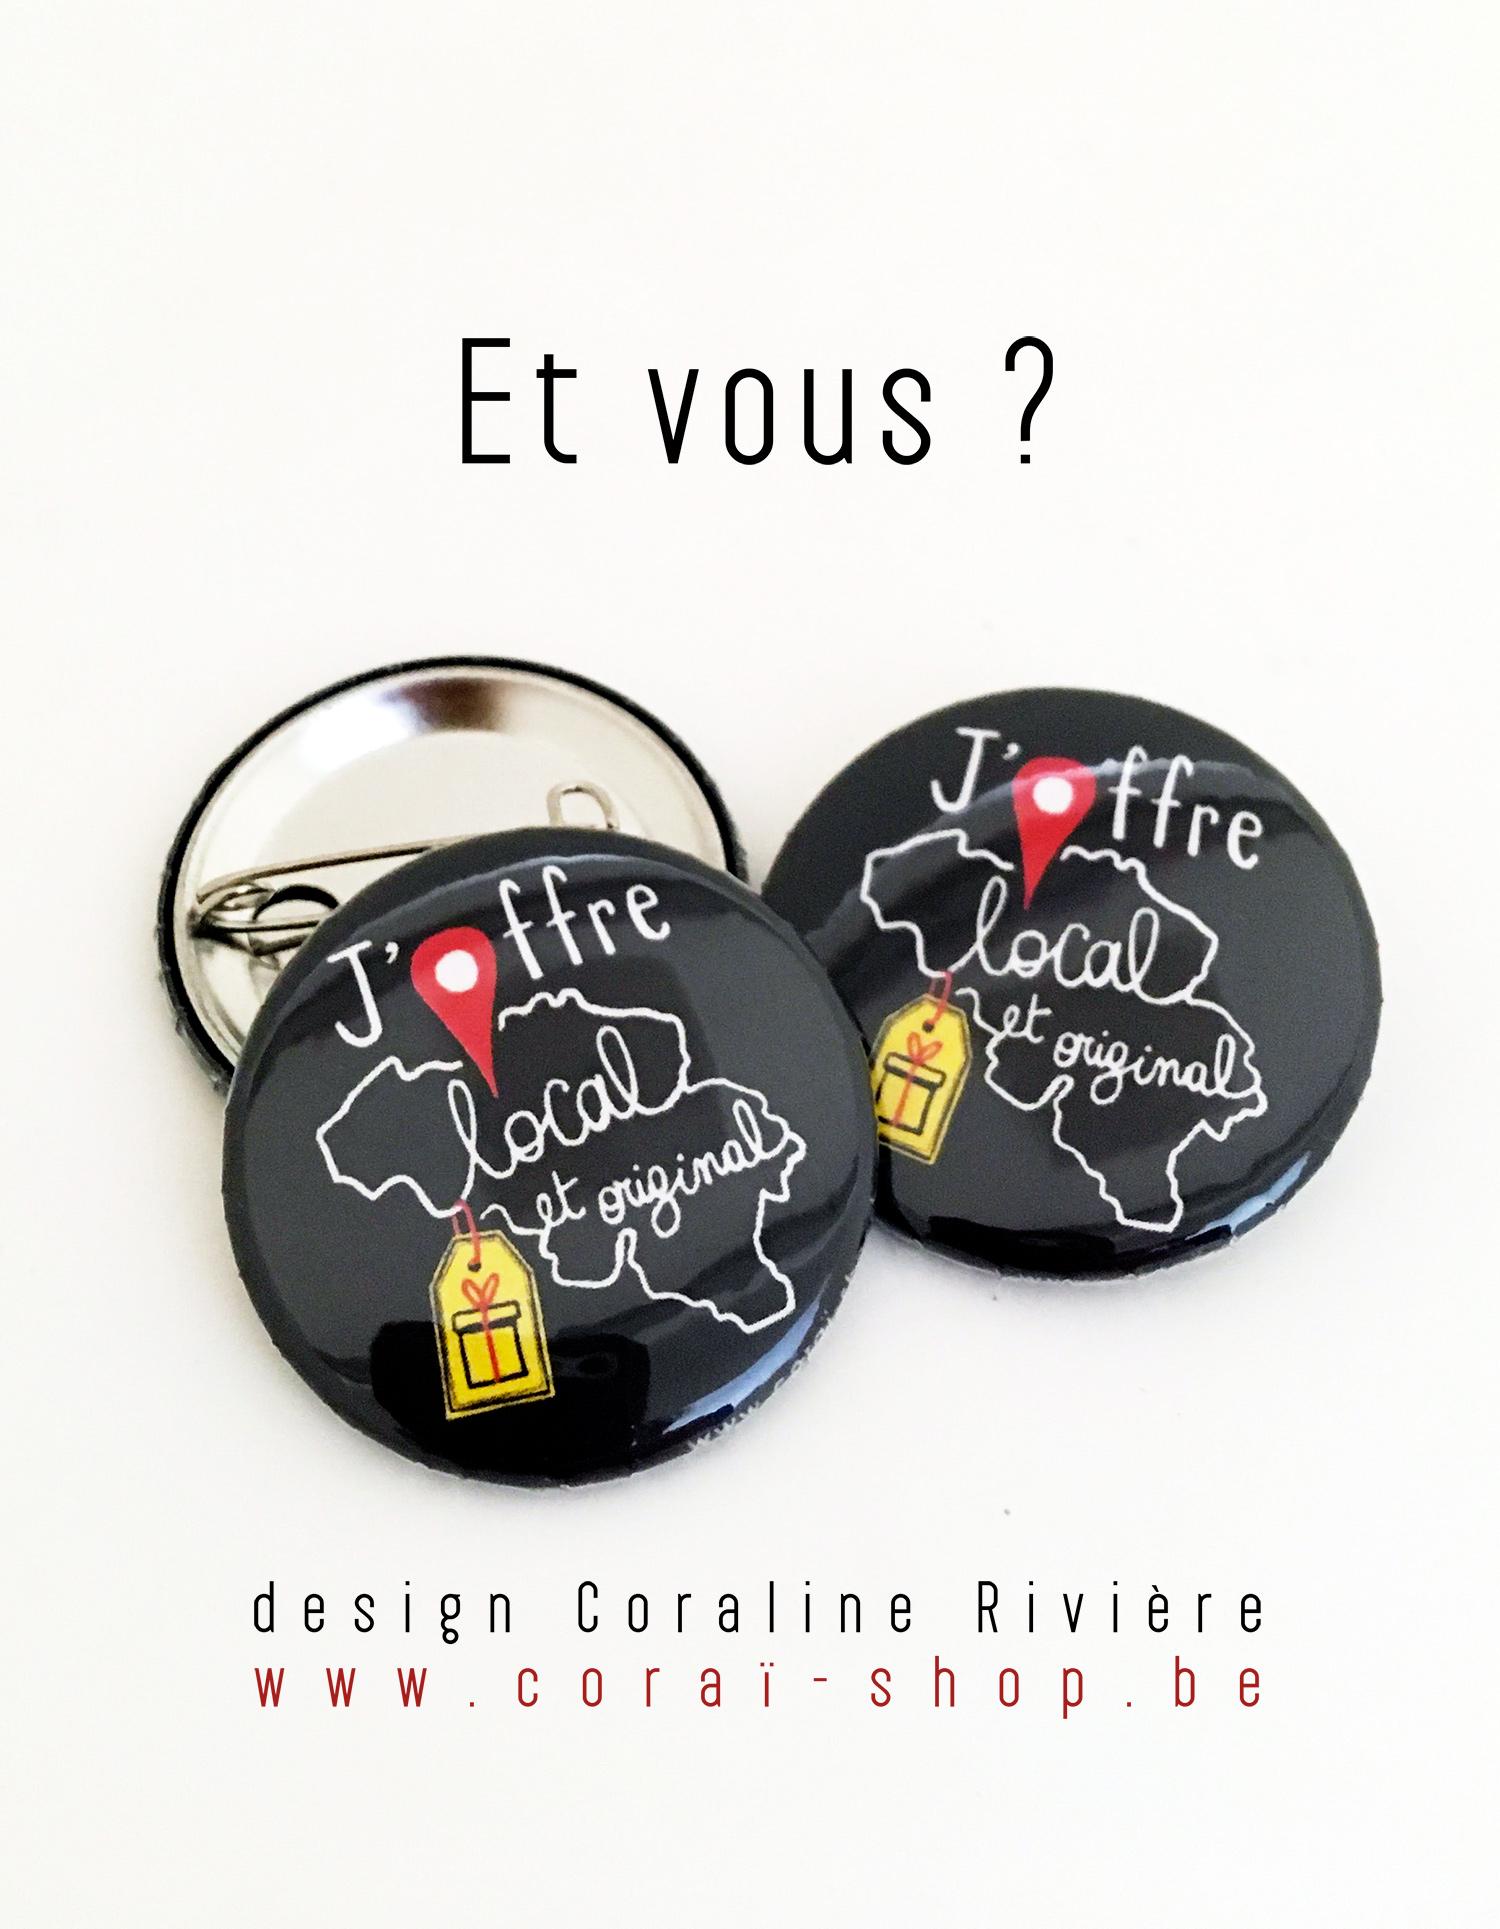 badge slogan belgique j offre local et original artisan producteu artiste